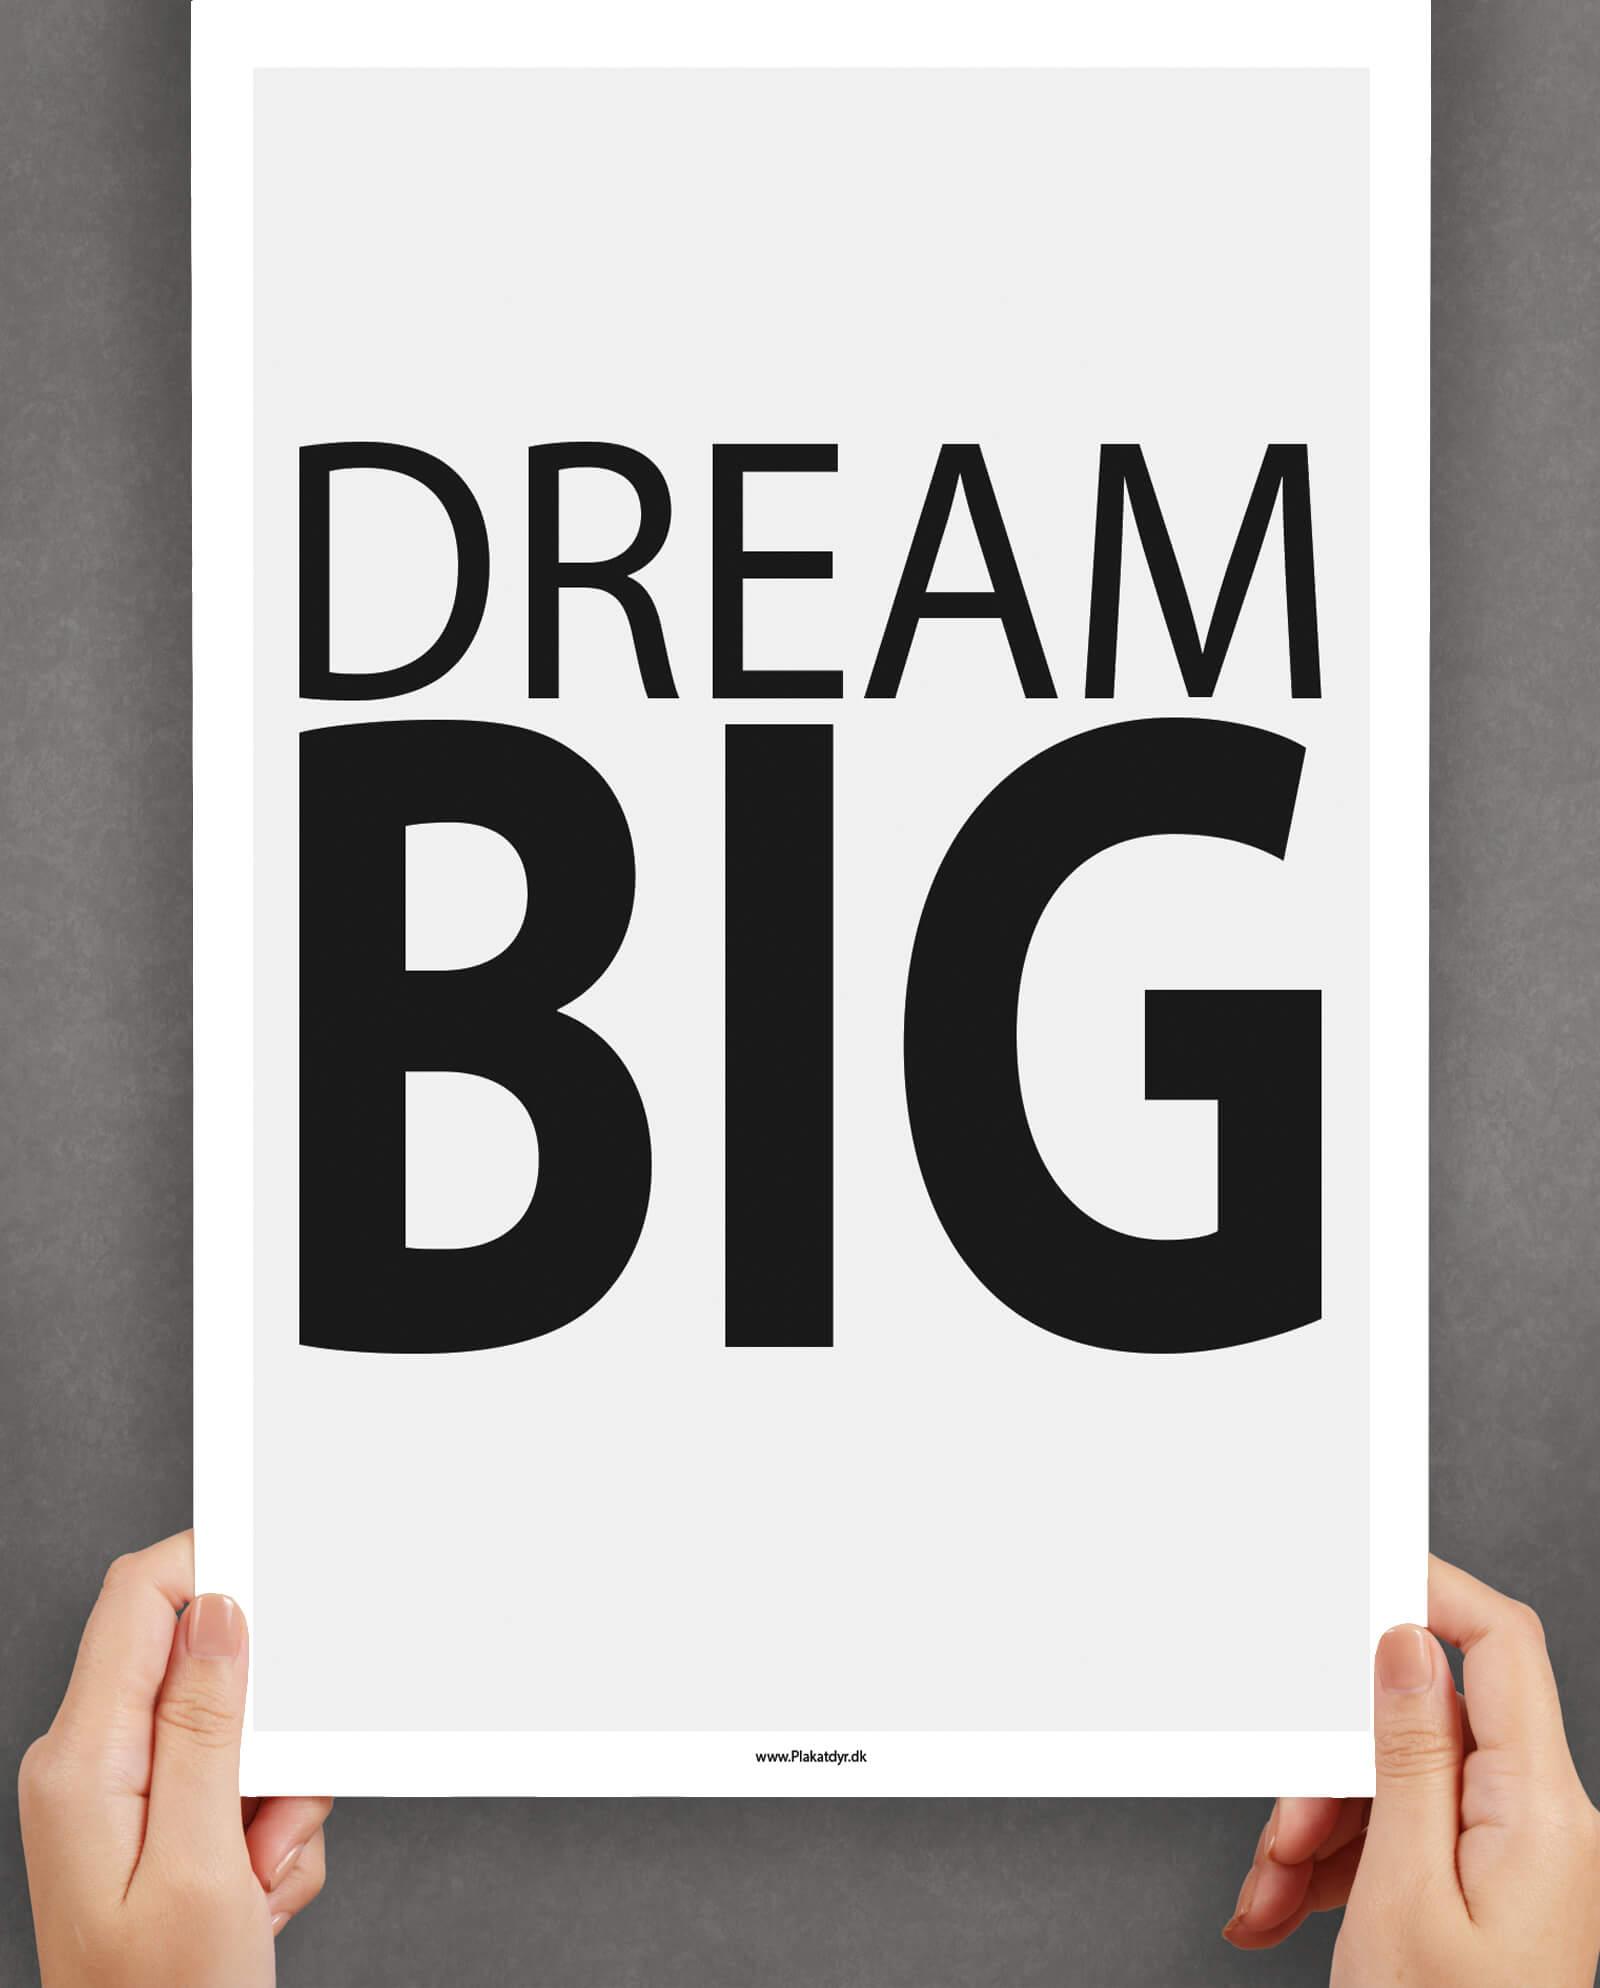 Dream-big-gamer-1